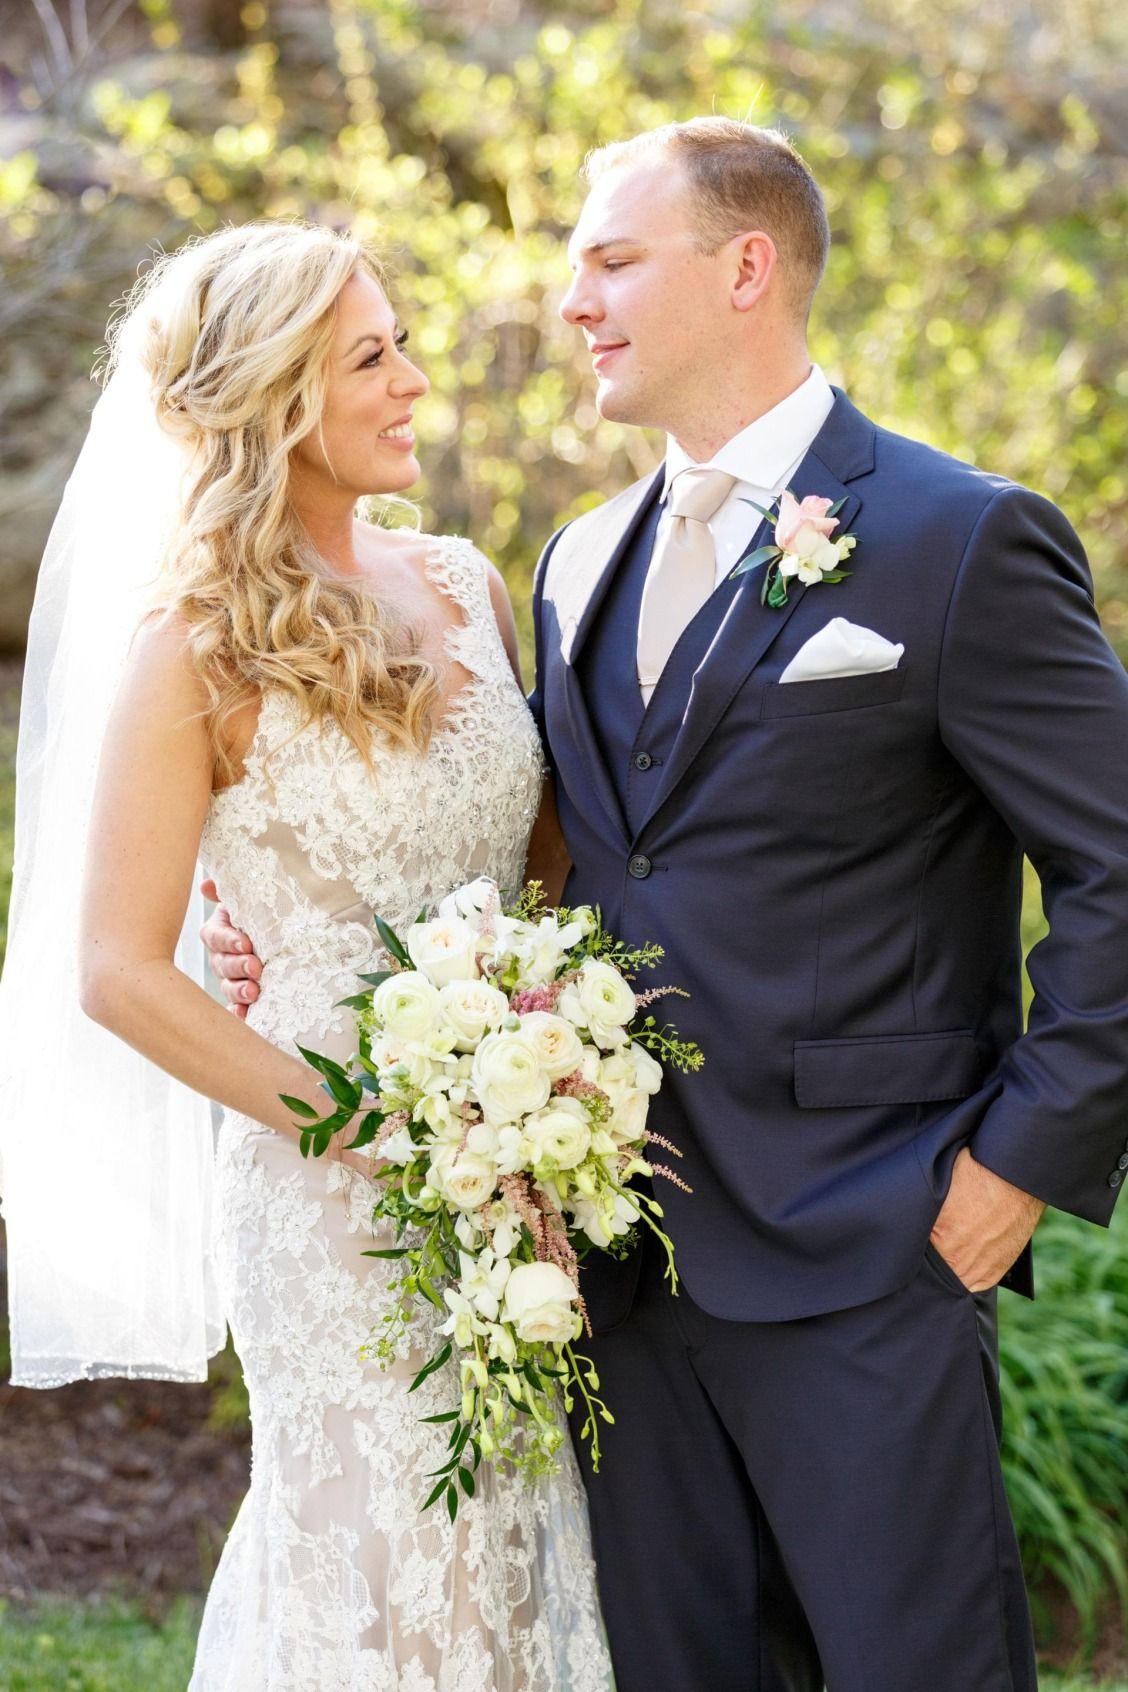 Classic Natural Nuptials In Powhatan Blue Wedding DressesBlue